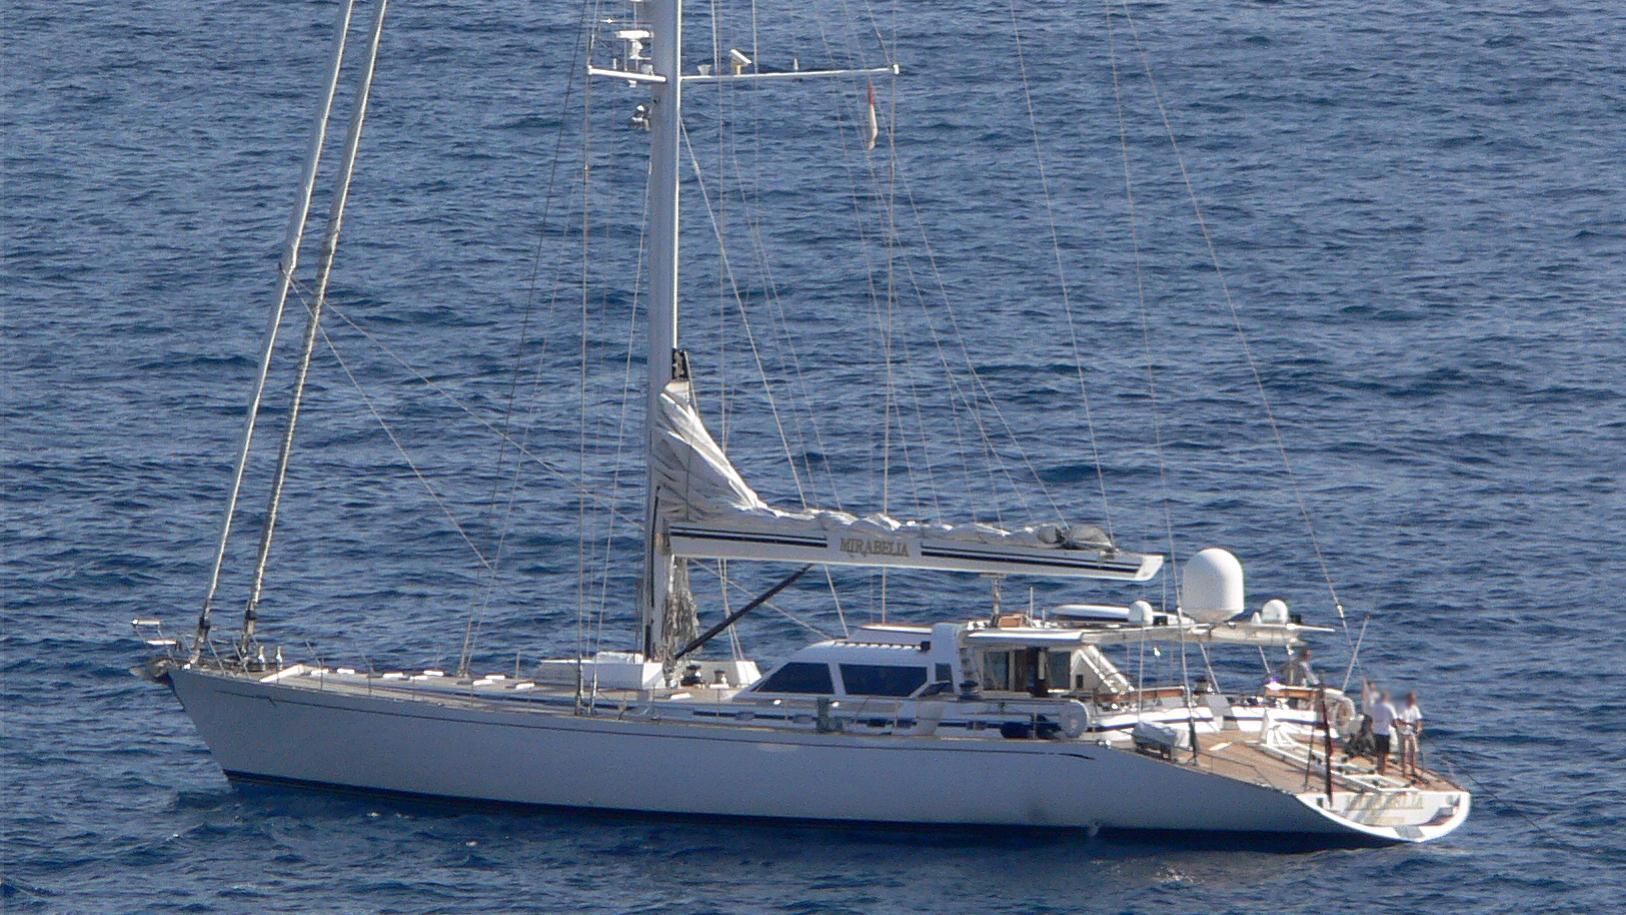 mirabella latitude sailing yacht concorde 40m 1992 half stern before refit